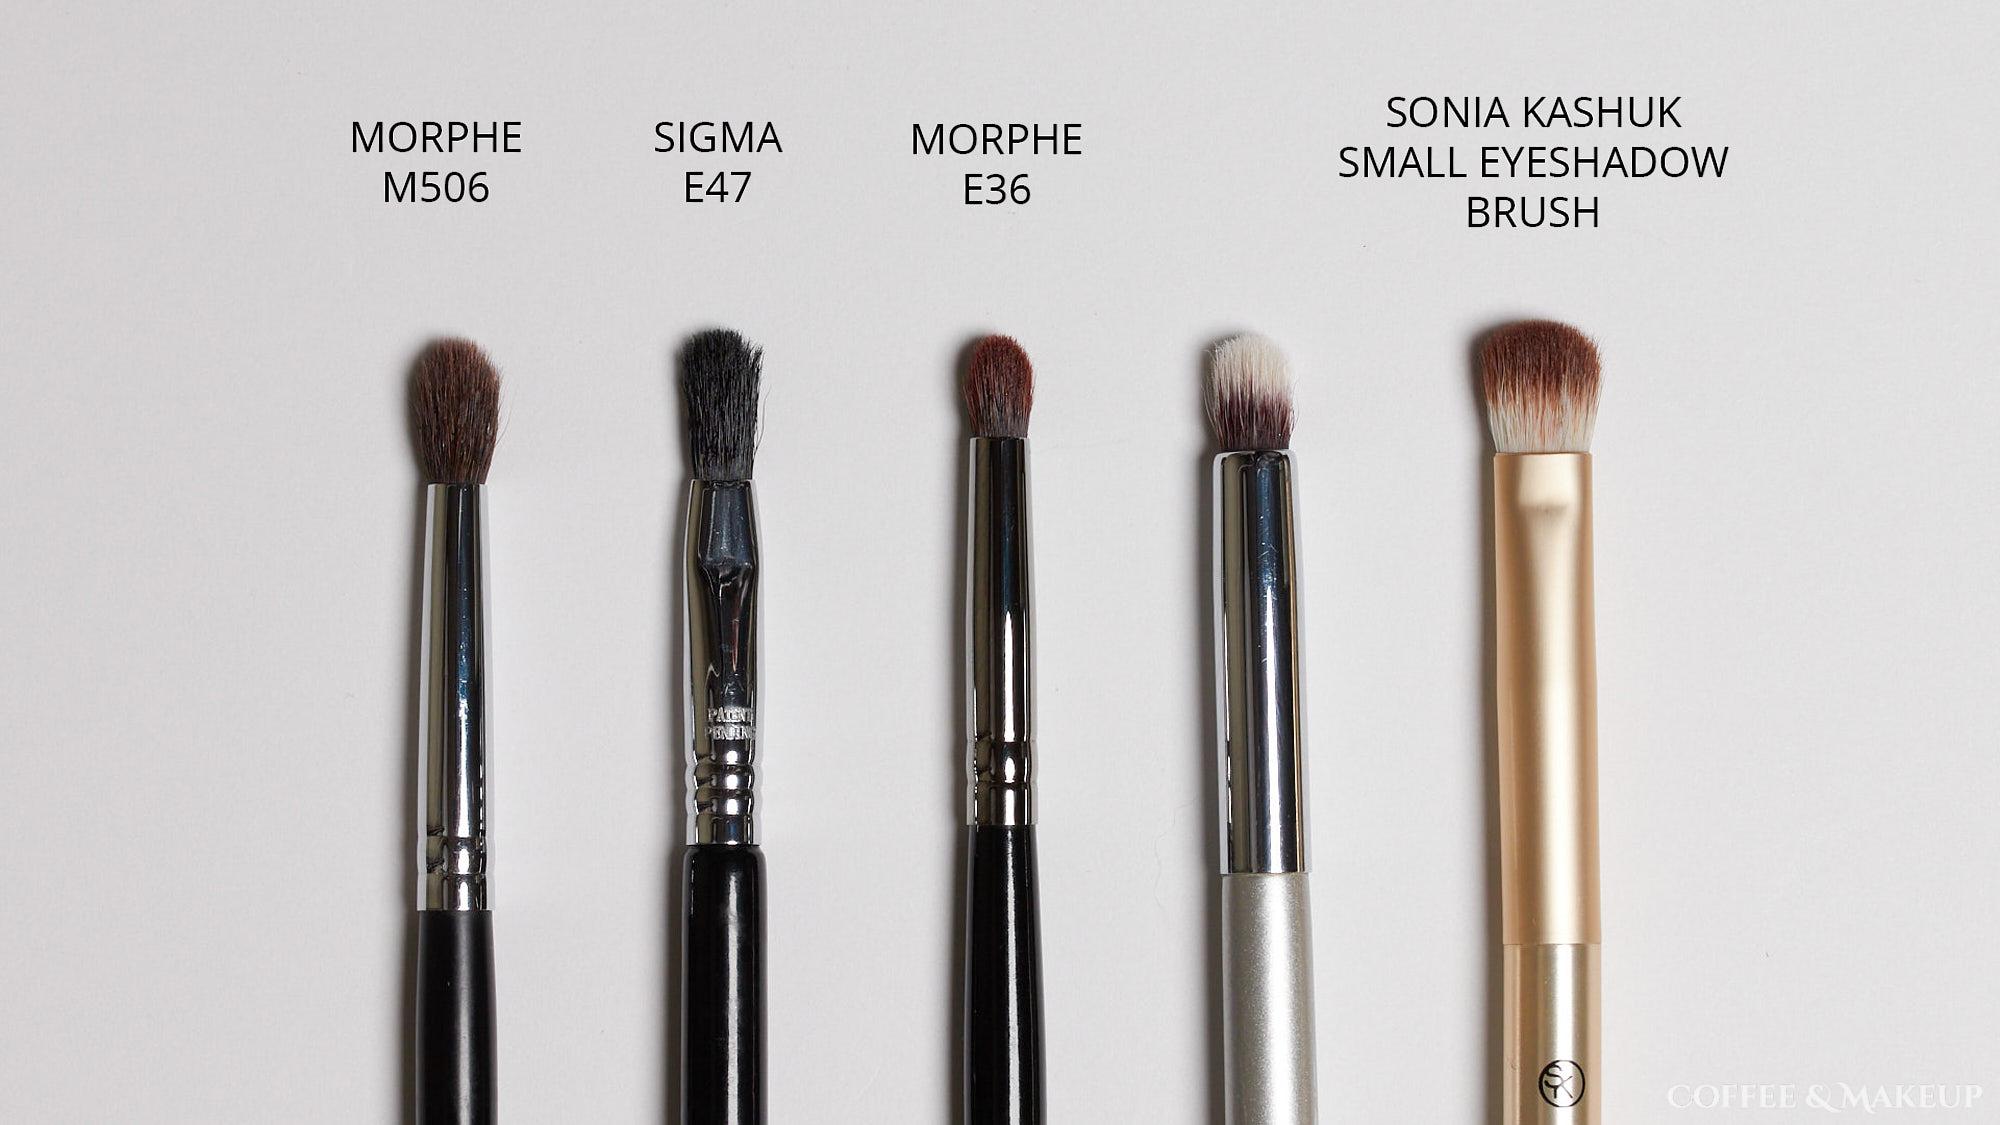 Morphe M506, Sigma E47, Morphe E36, Sonia Kashuk Small Eyeshadow Brush